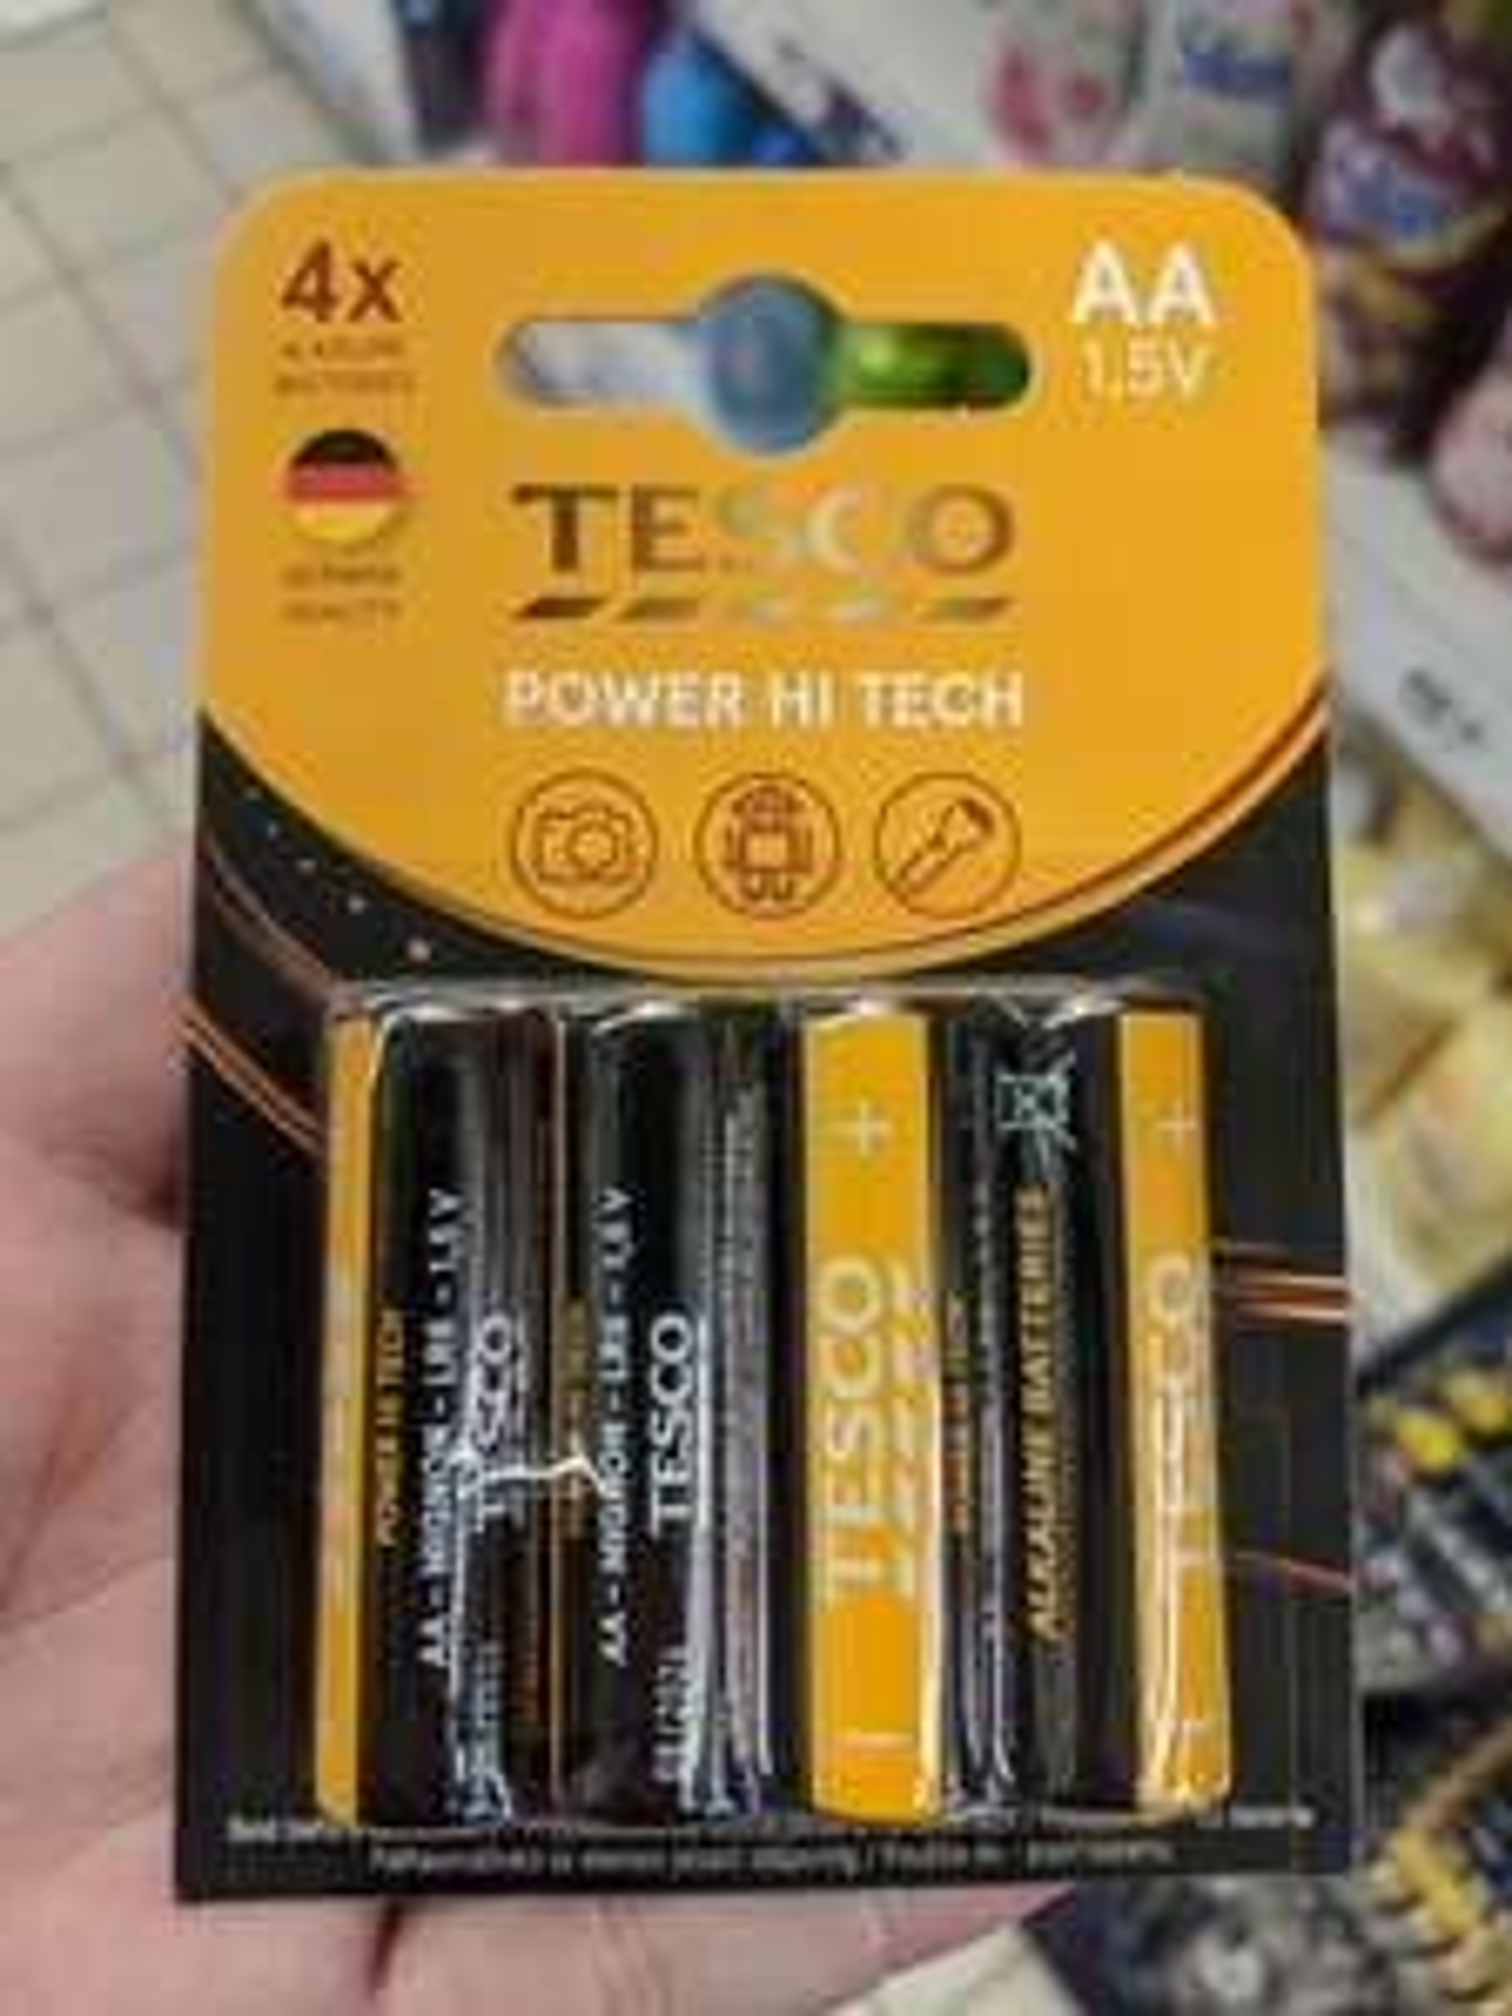 Baterie AA, AAA 1,5V Tesco paluszki 4 sztuki. Tesco Dąbrowa Górnicza